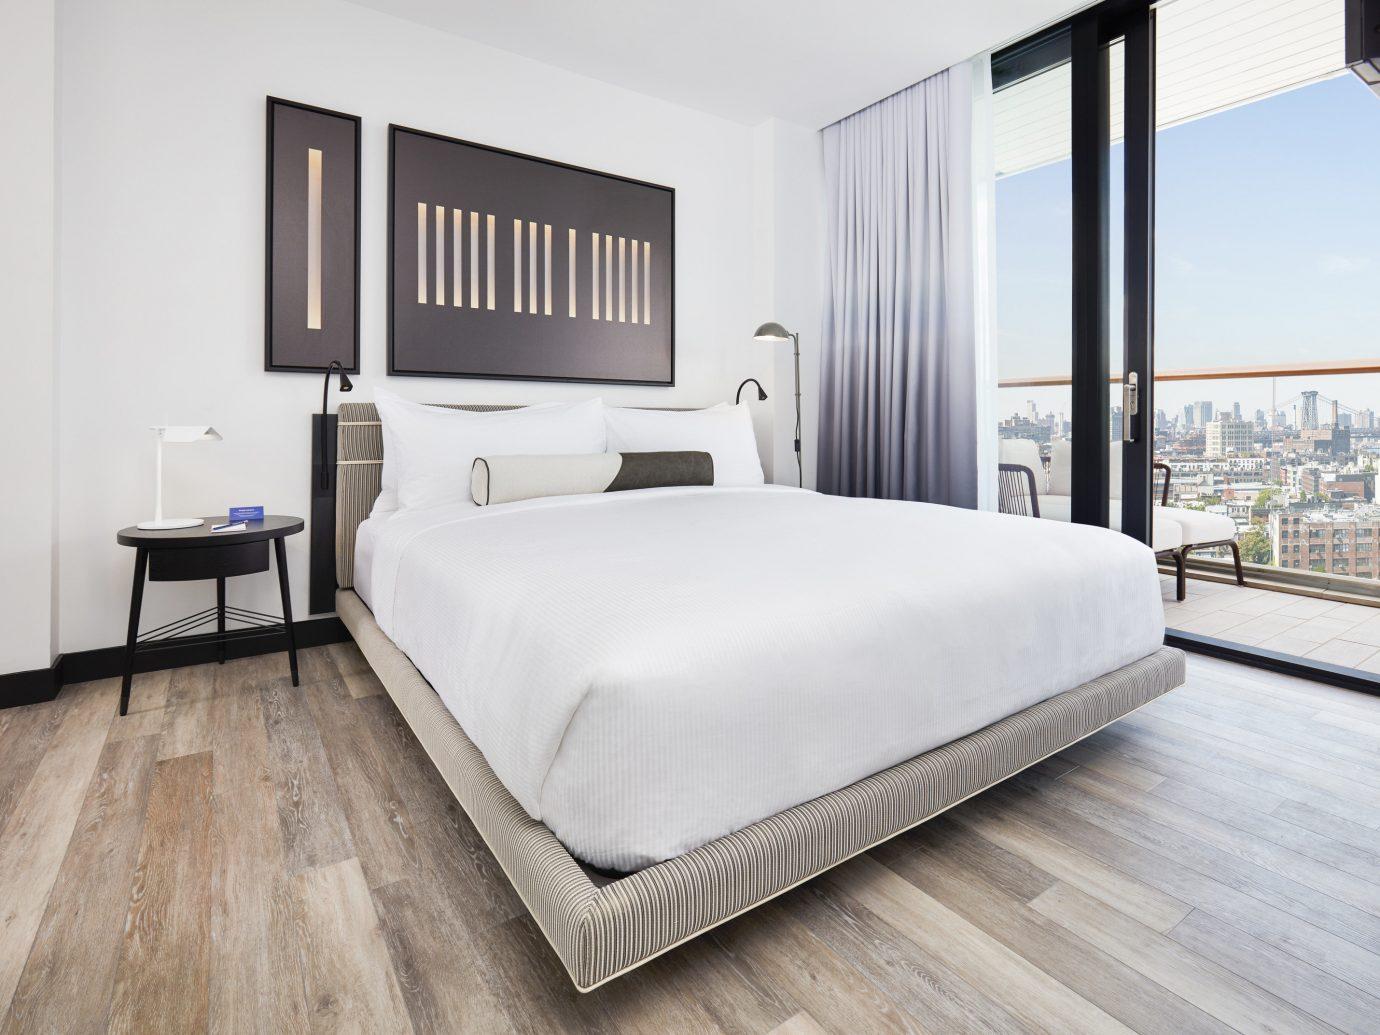 Hotels floor bed indoor wall room Bedroom property window hotel hardwood bed frame furniture real estate interior design estate bed sheet wood flooring flooring laminate flooring Suite